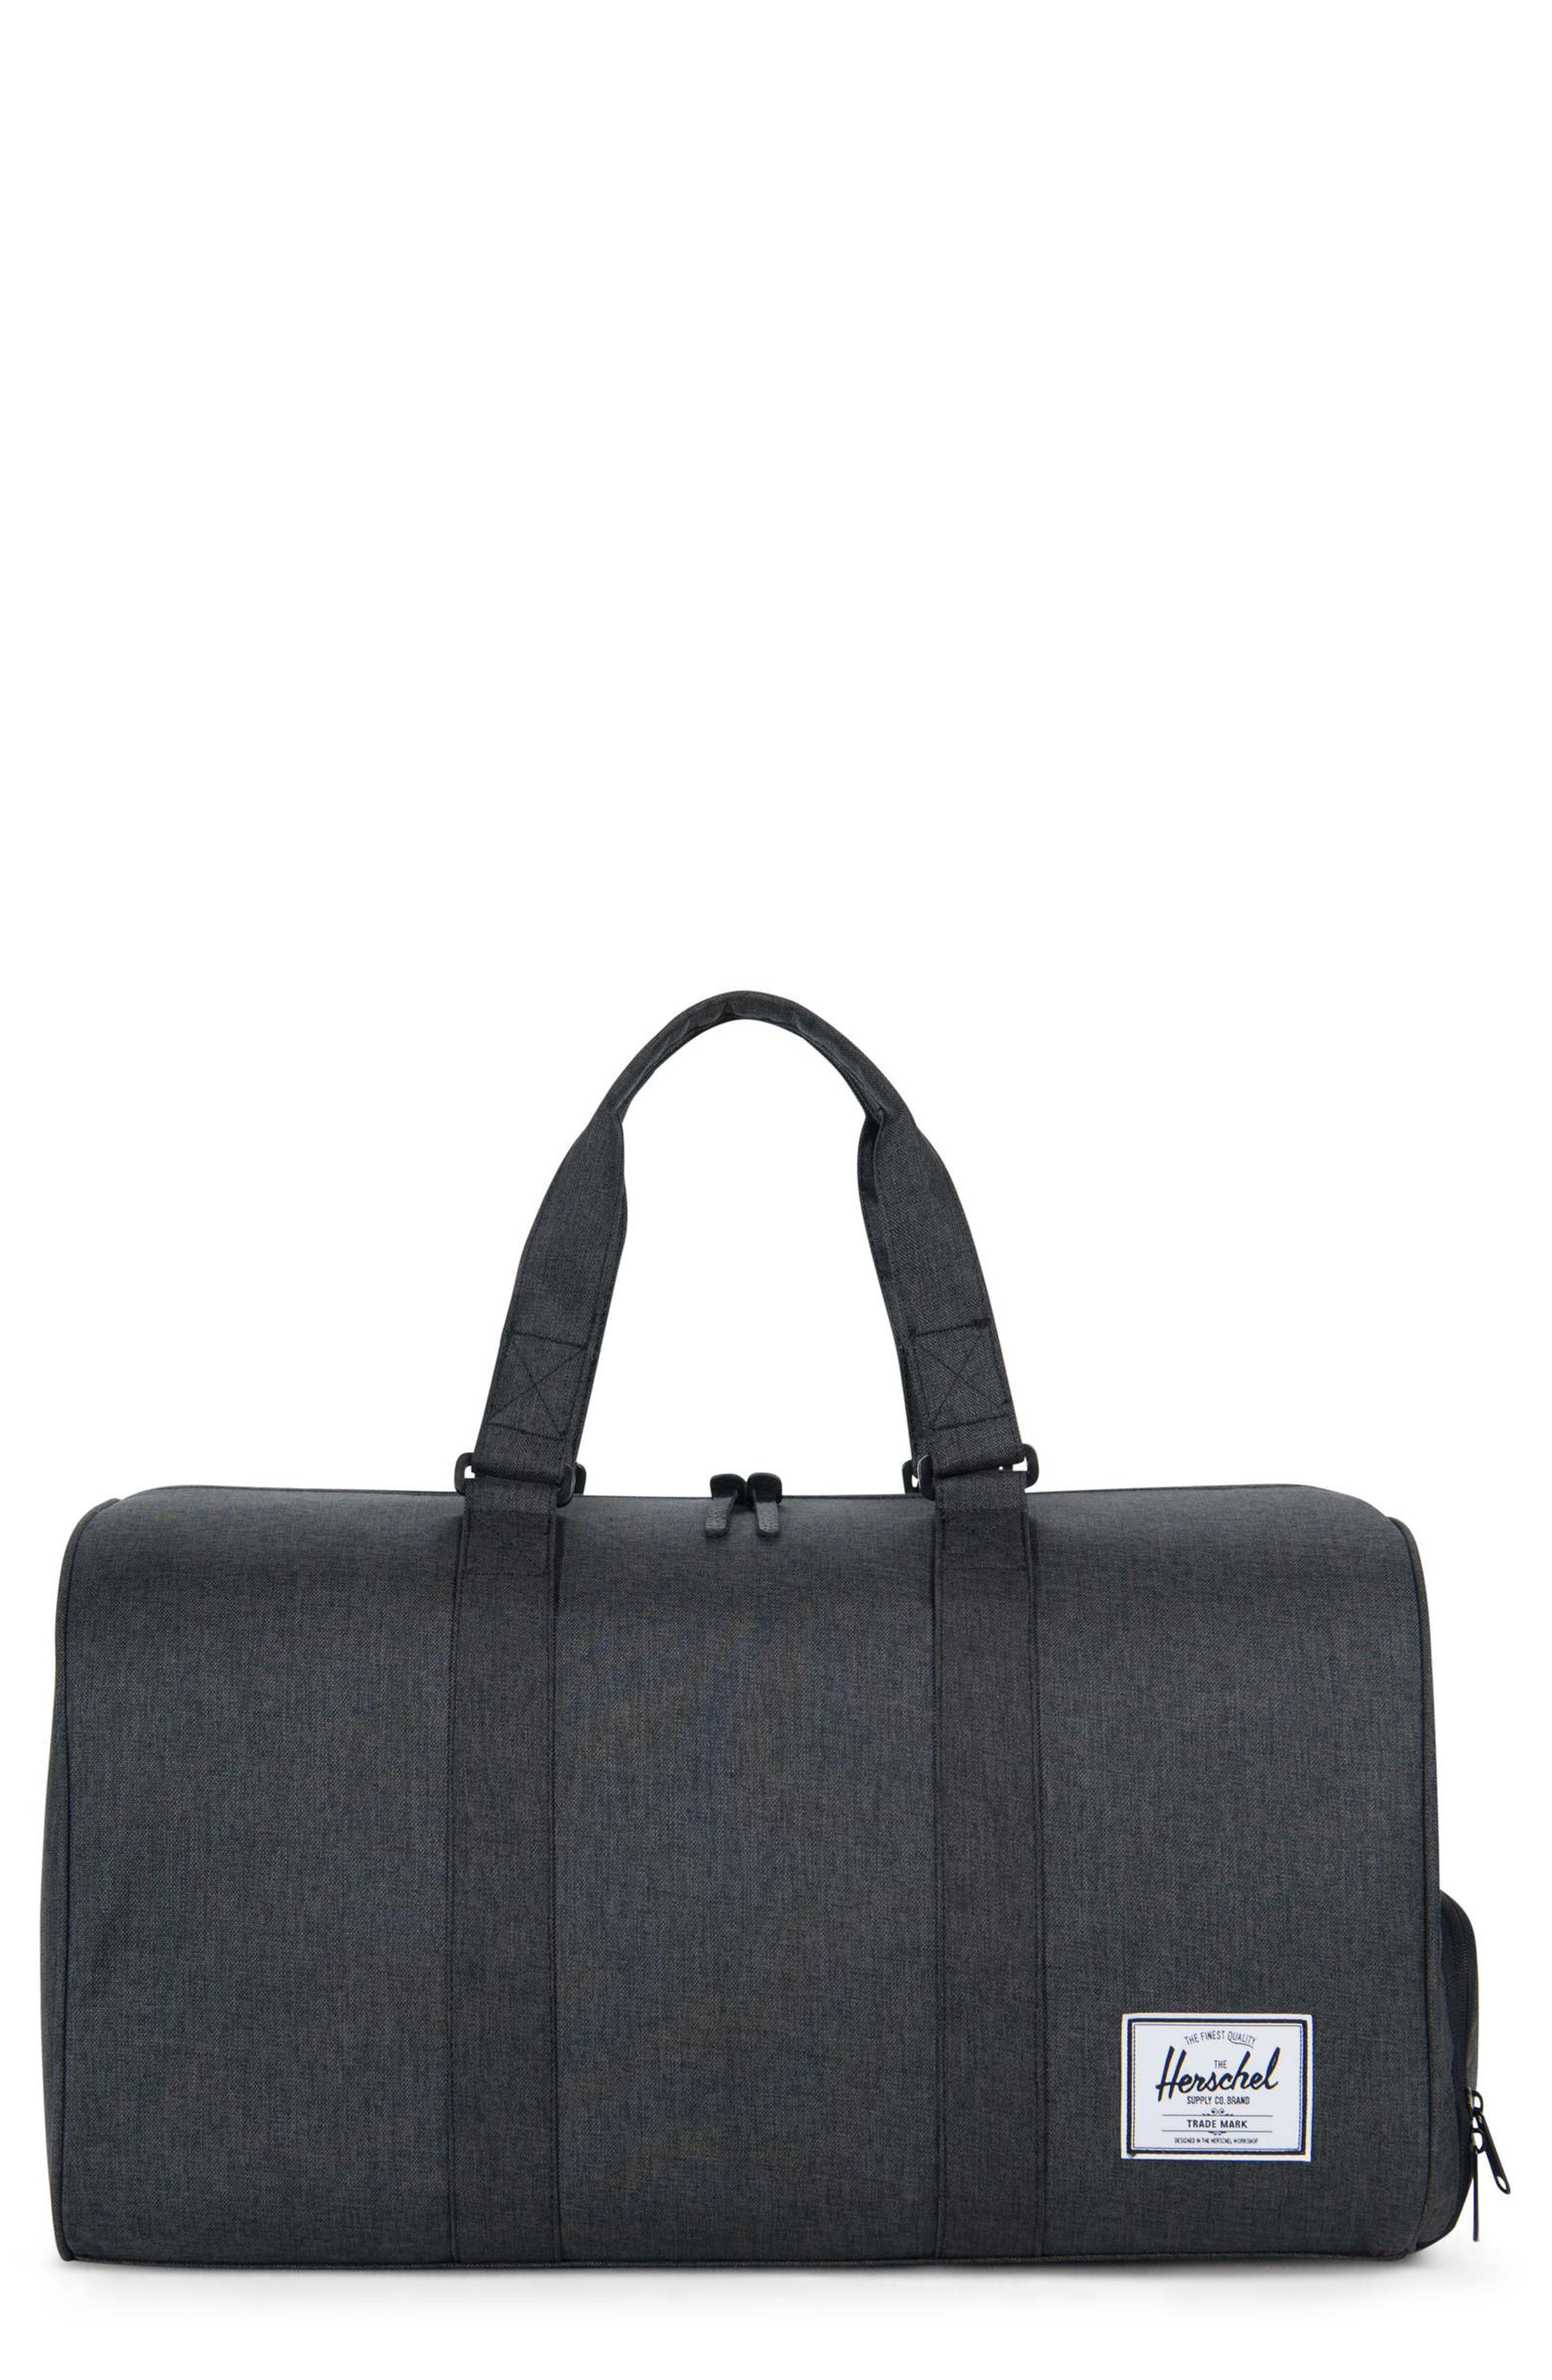 HERSCHEL SUPPLY CO. Novel Duffle Bag, Main, color, BLACK CROSSHATCH